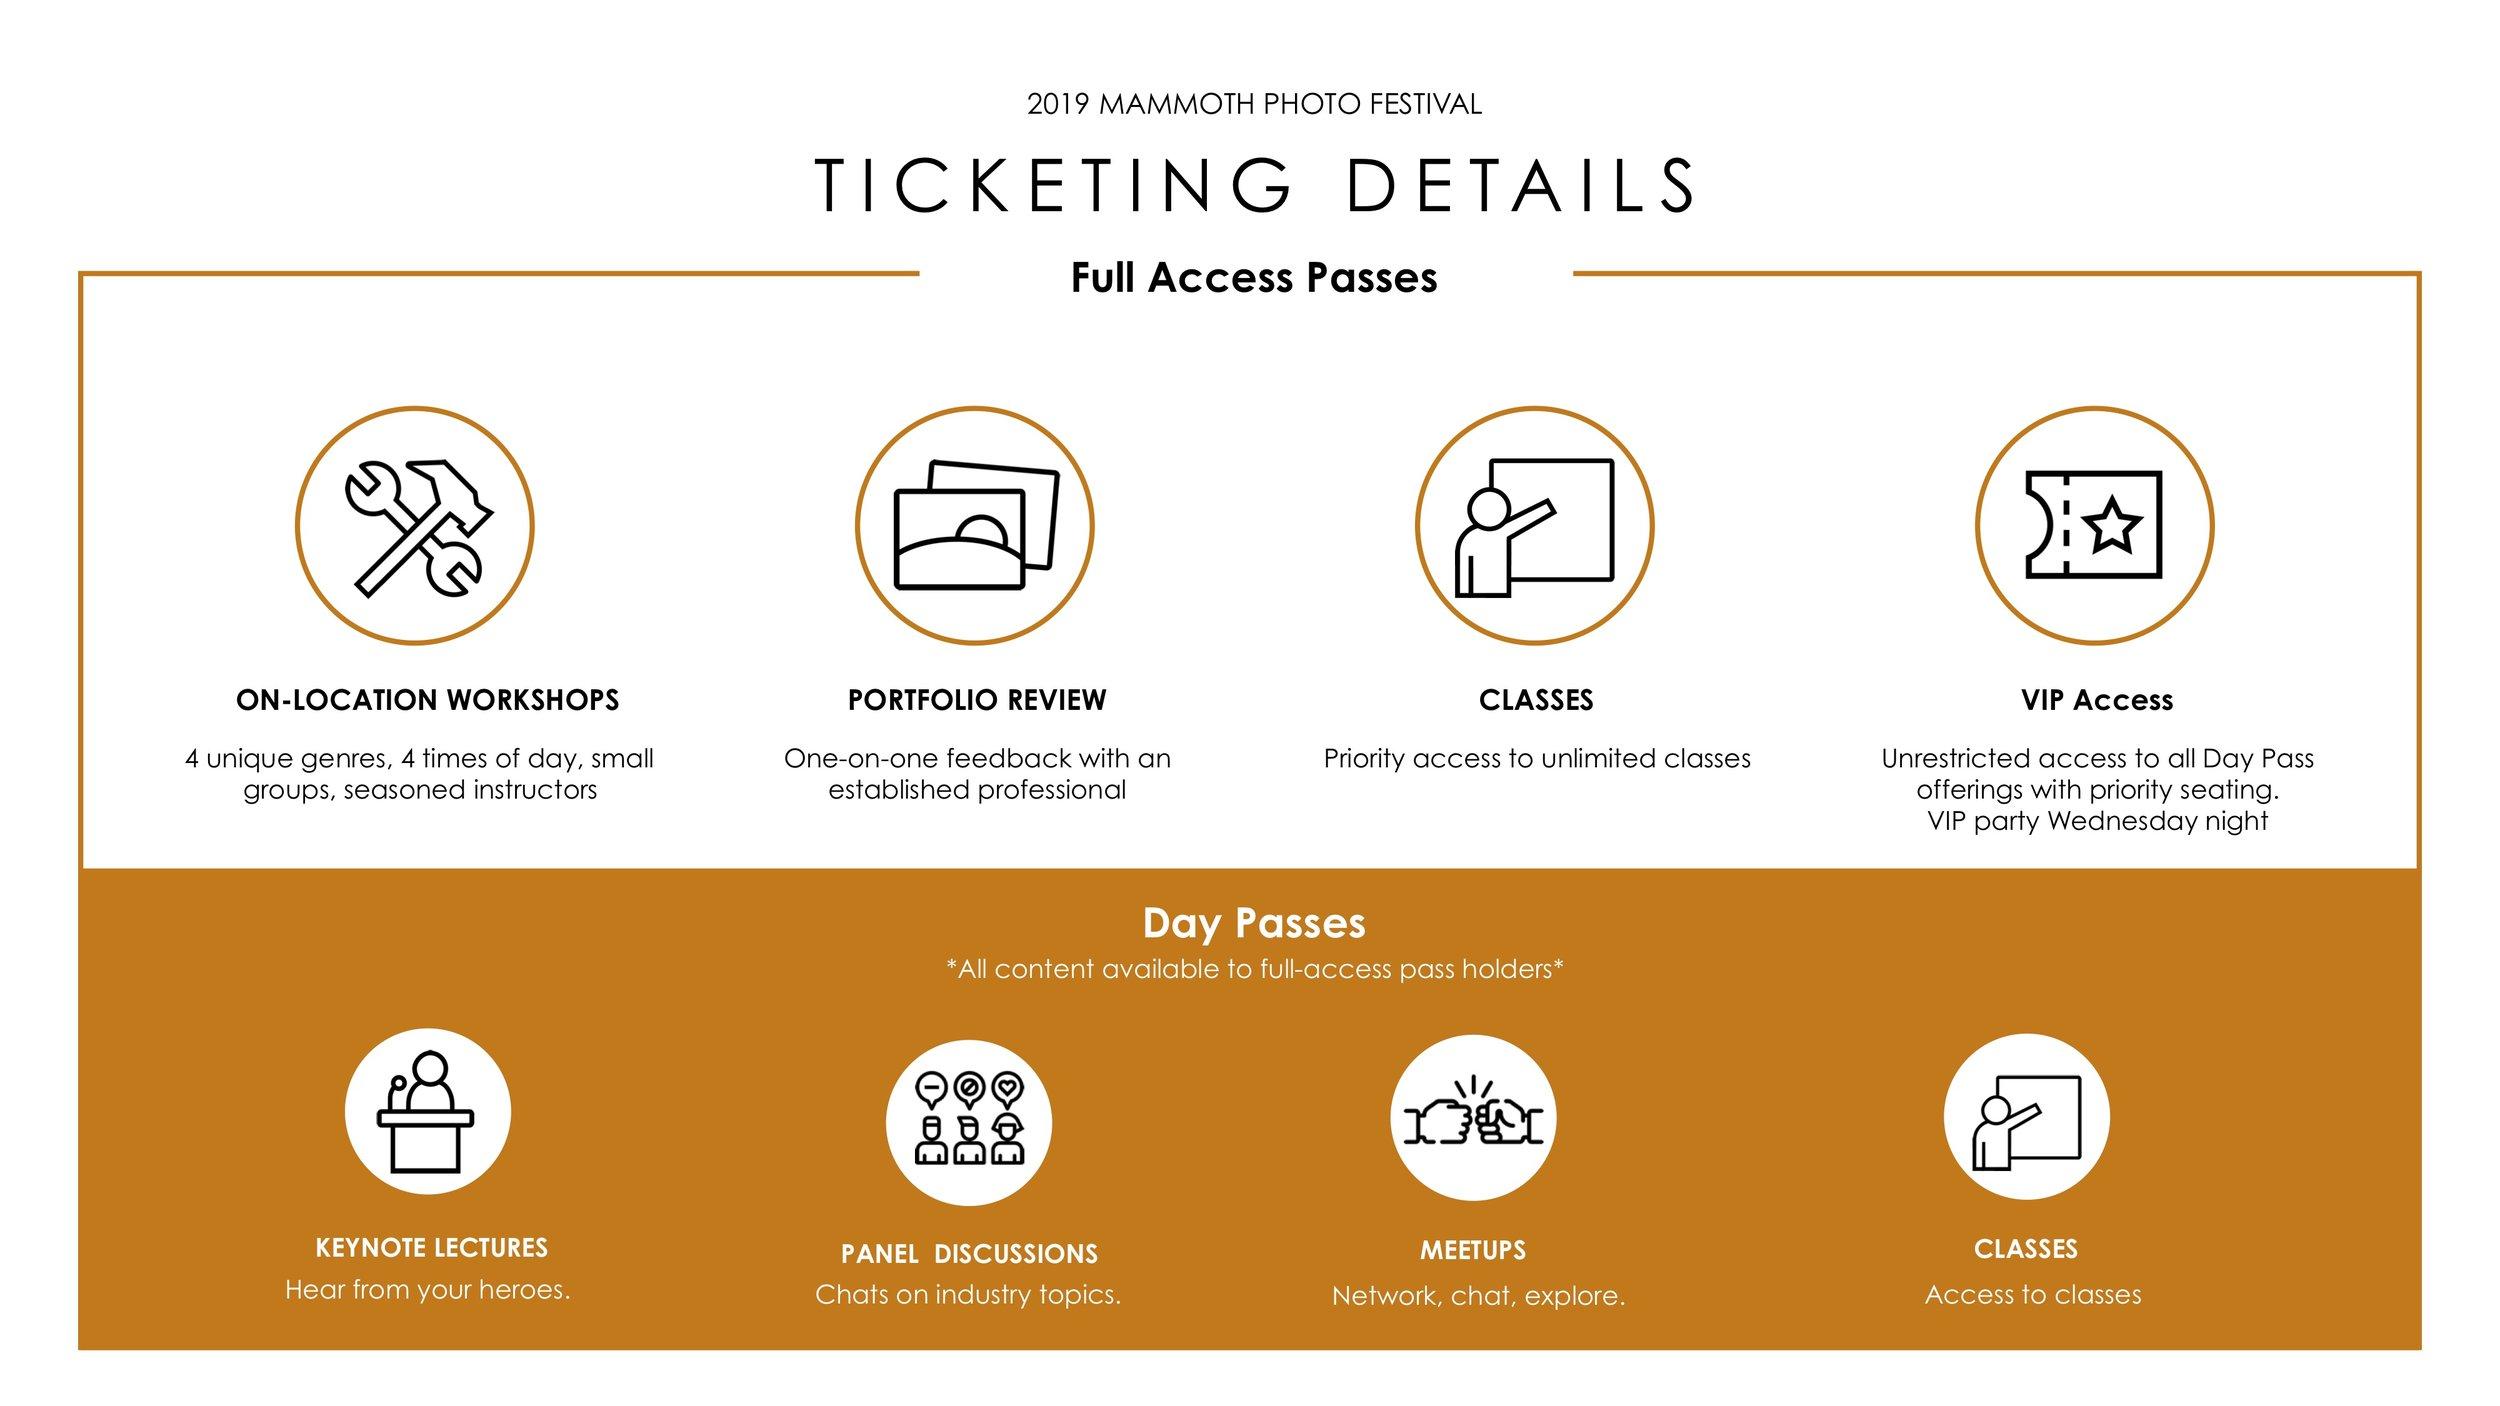 Mammoth Photo Festival Ticket Details